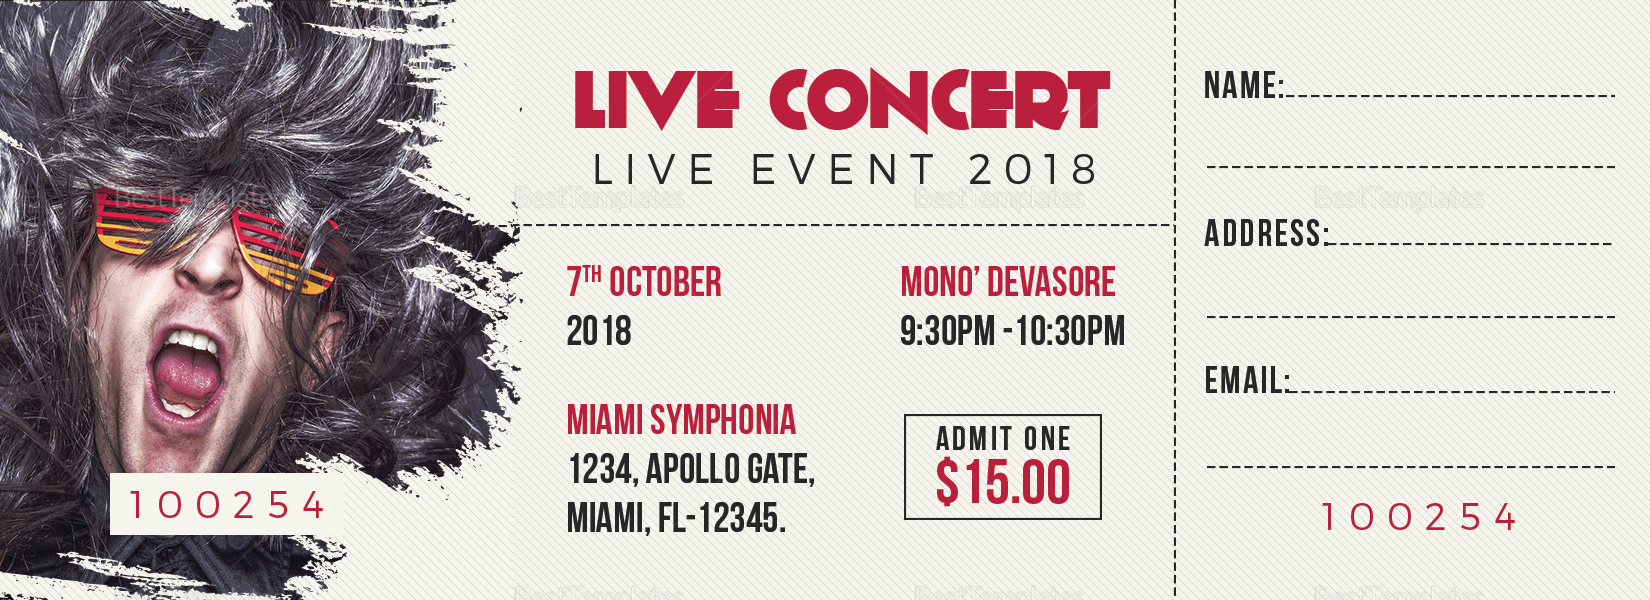 Live Concert Ticket Design Template